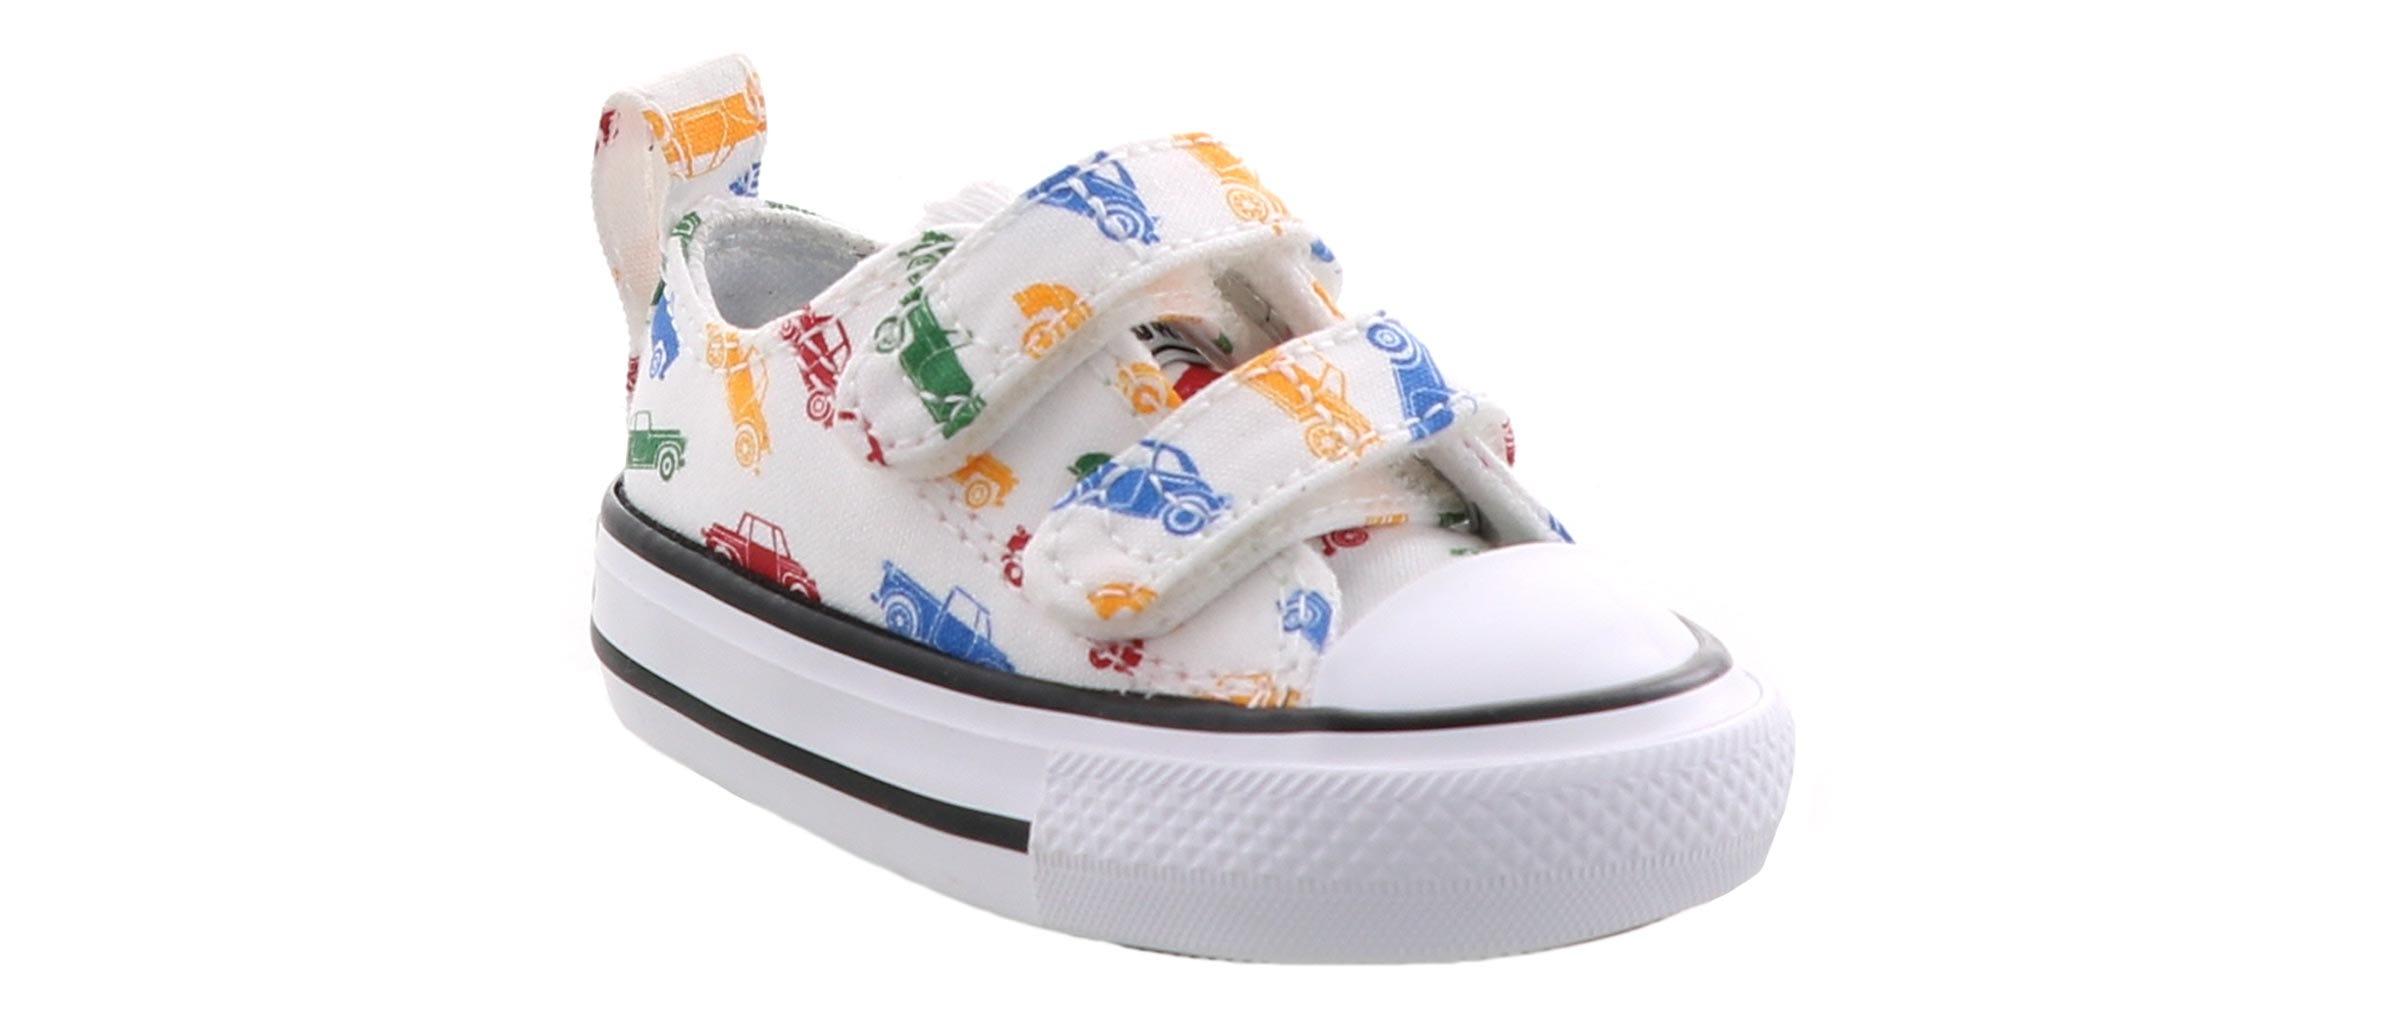 Converse Cars Toddler Boys' (Sizes 5-10) Sneaker